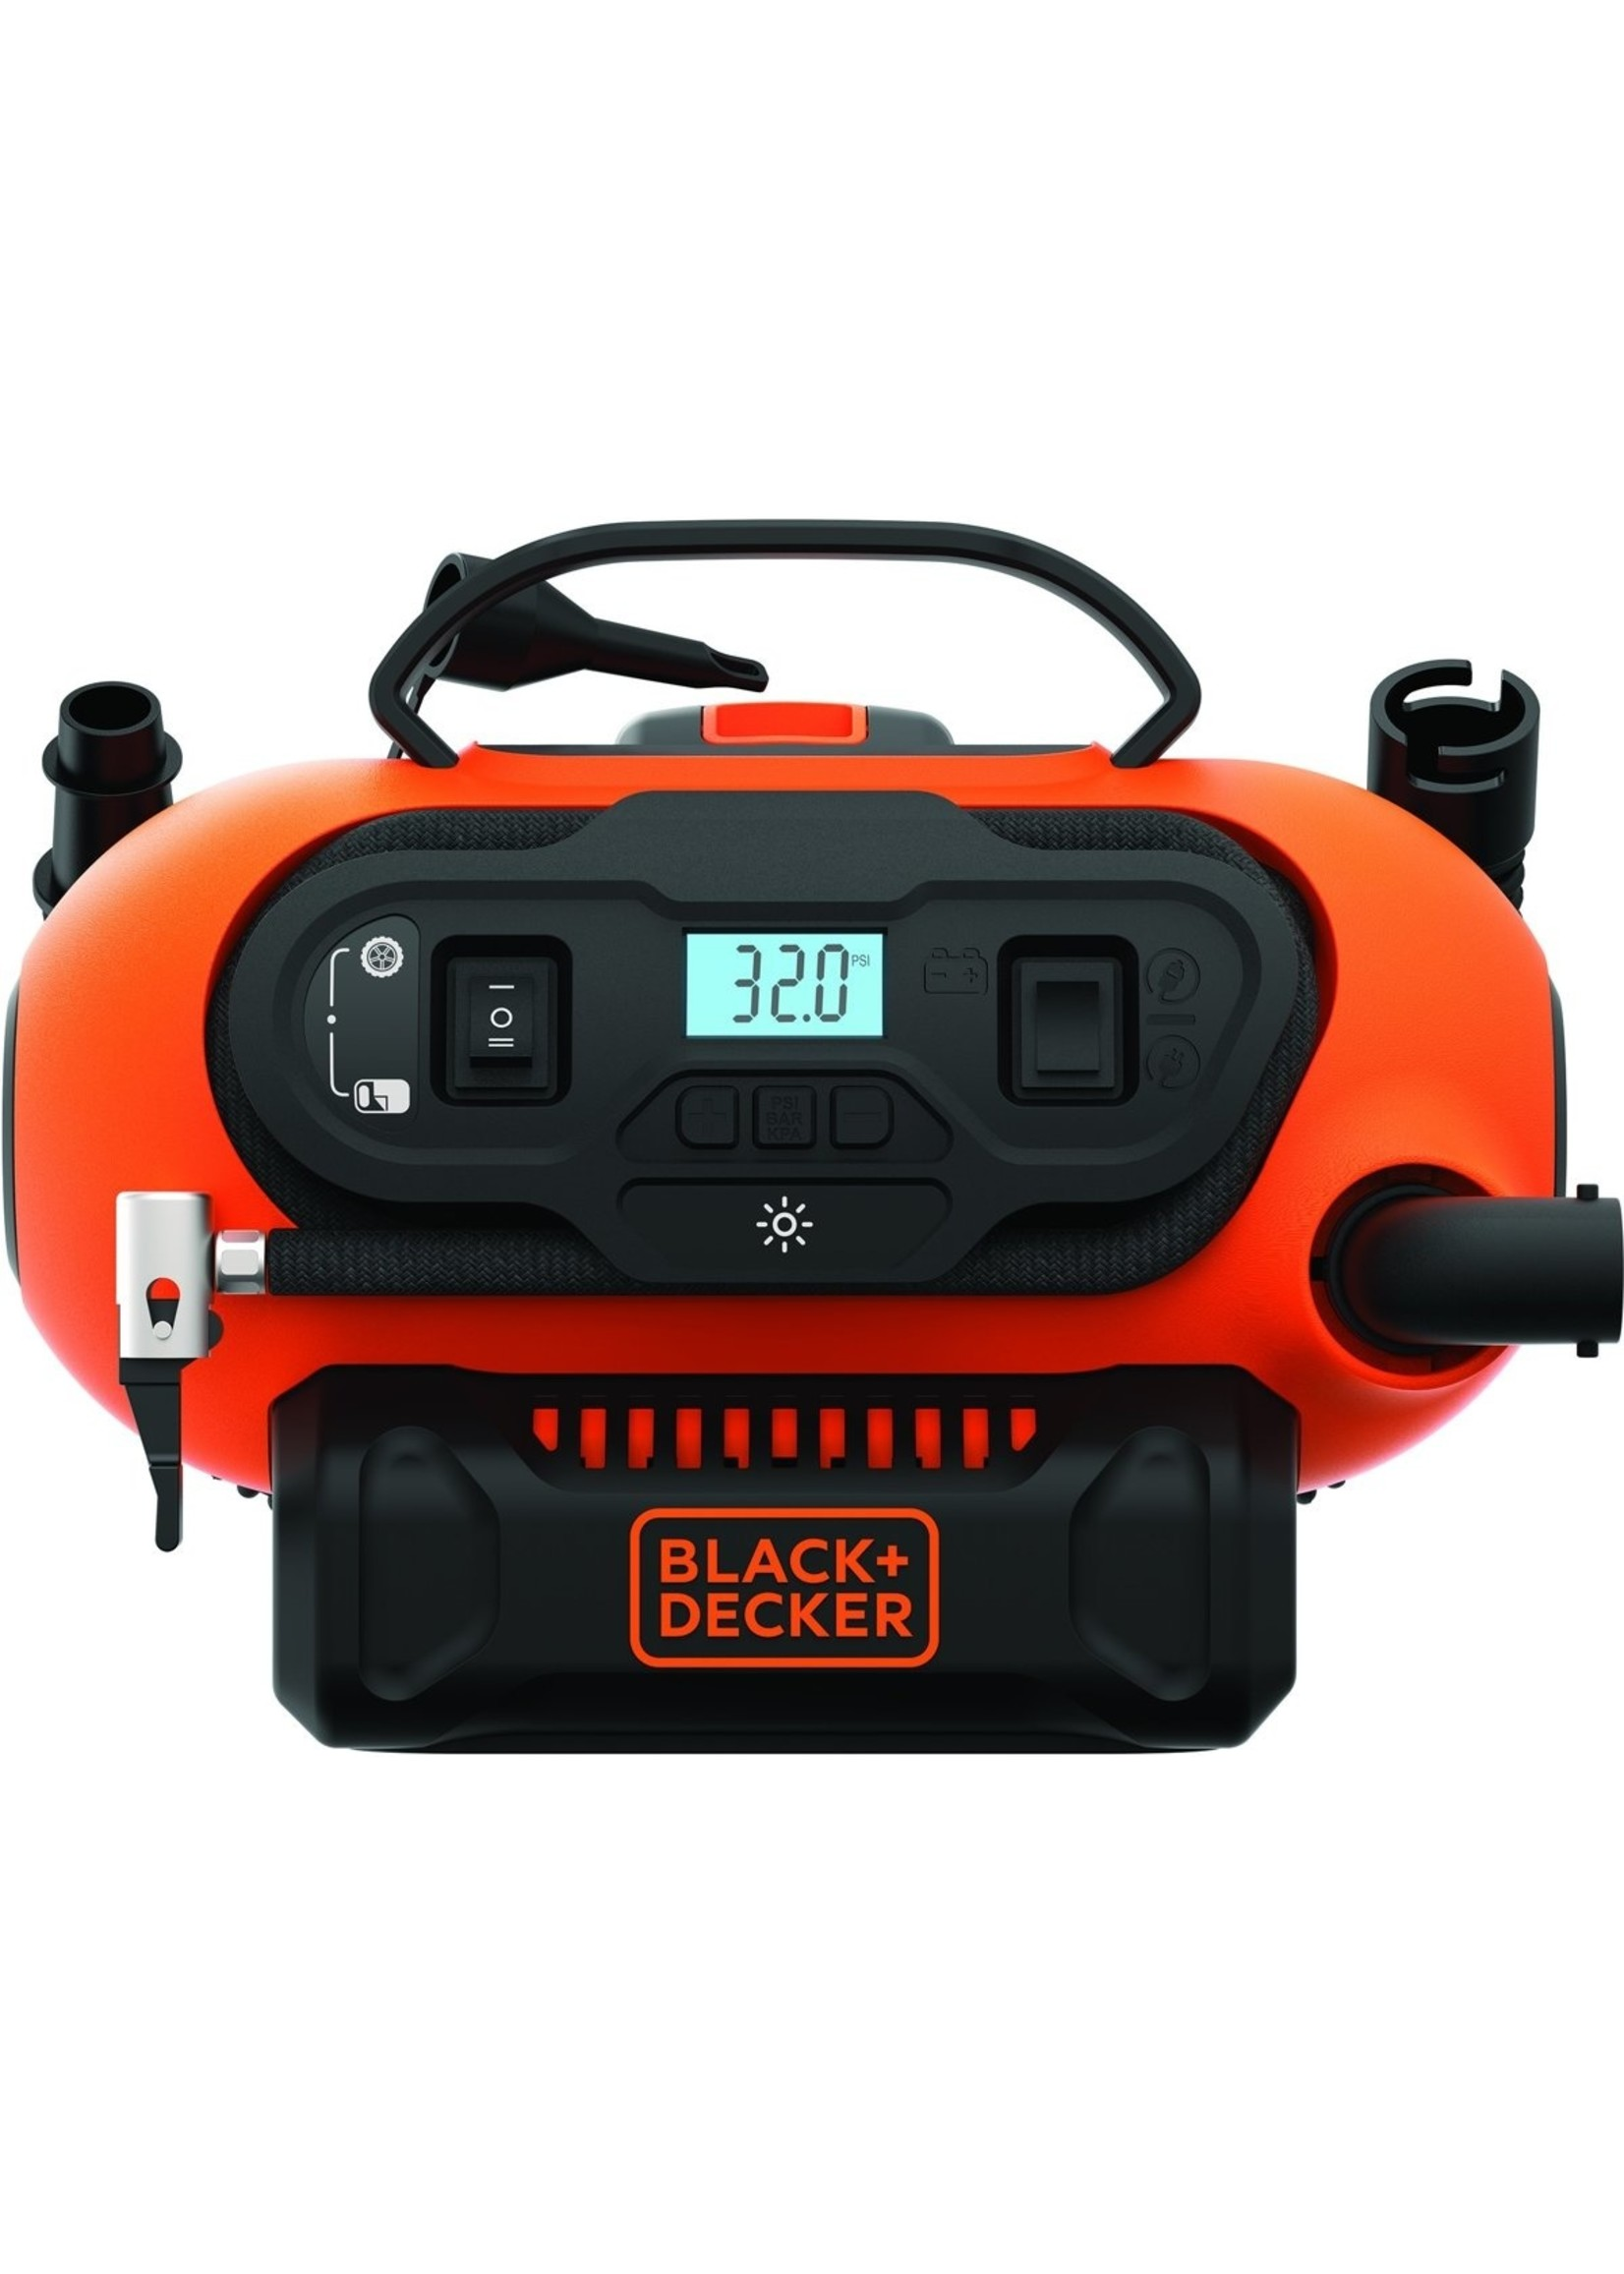 Black & Decker Black & Decker - BDCINF18N-QS - AC/DC compressor 160 PSI / 11.03 bar